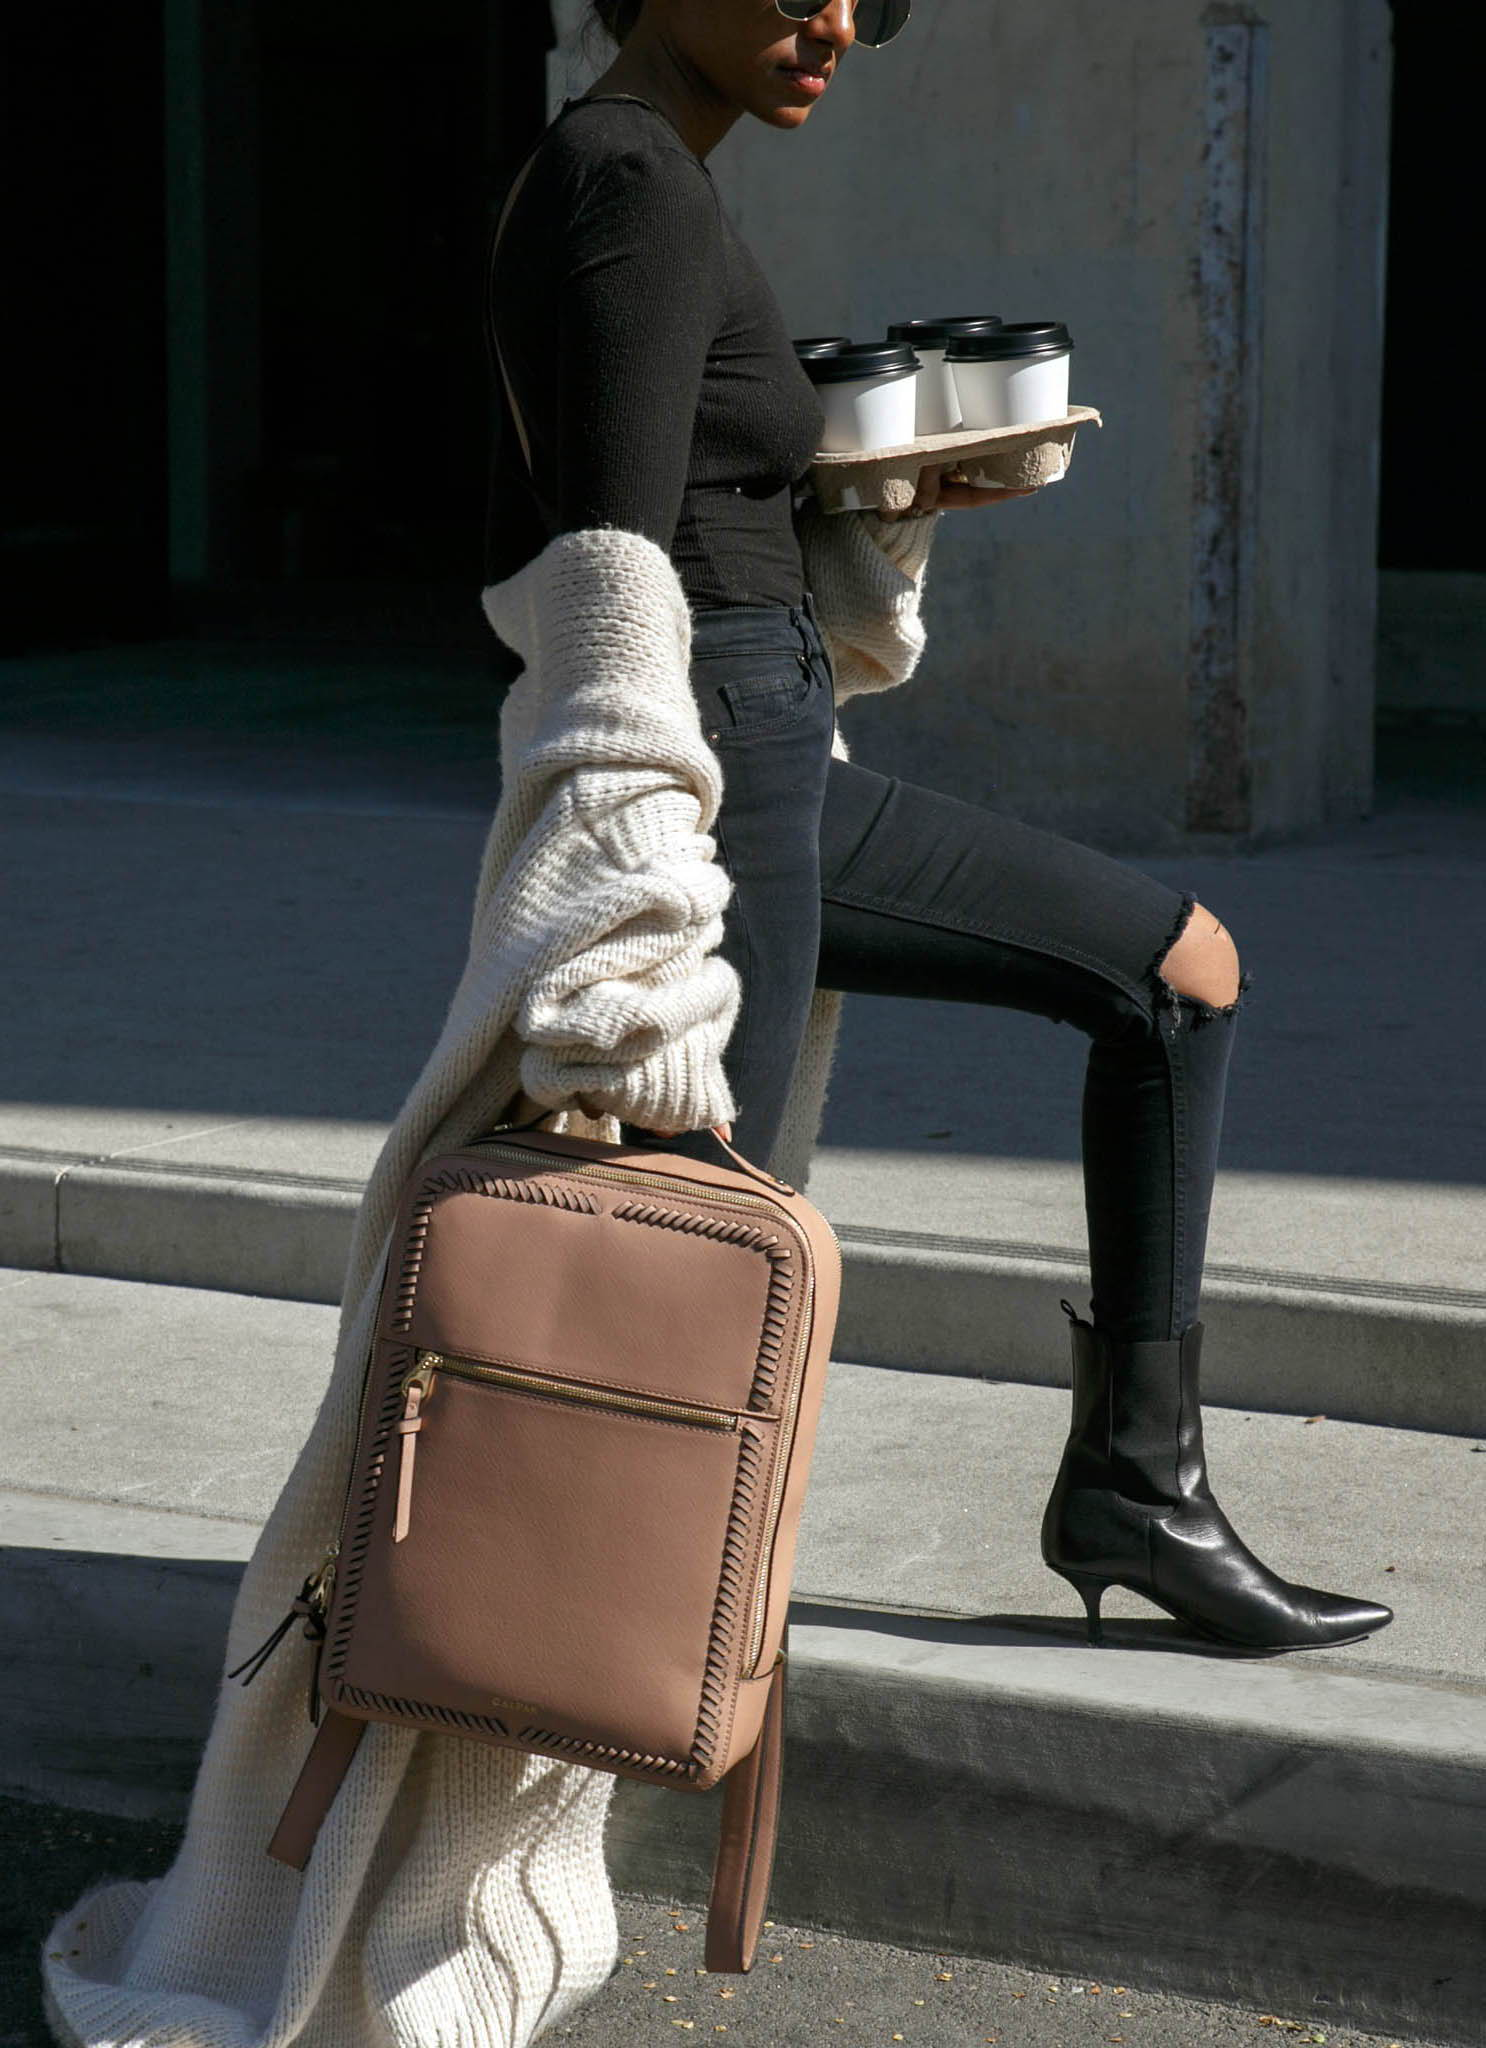 model with CALPAK Kaya laptop backpack in caramel color